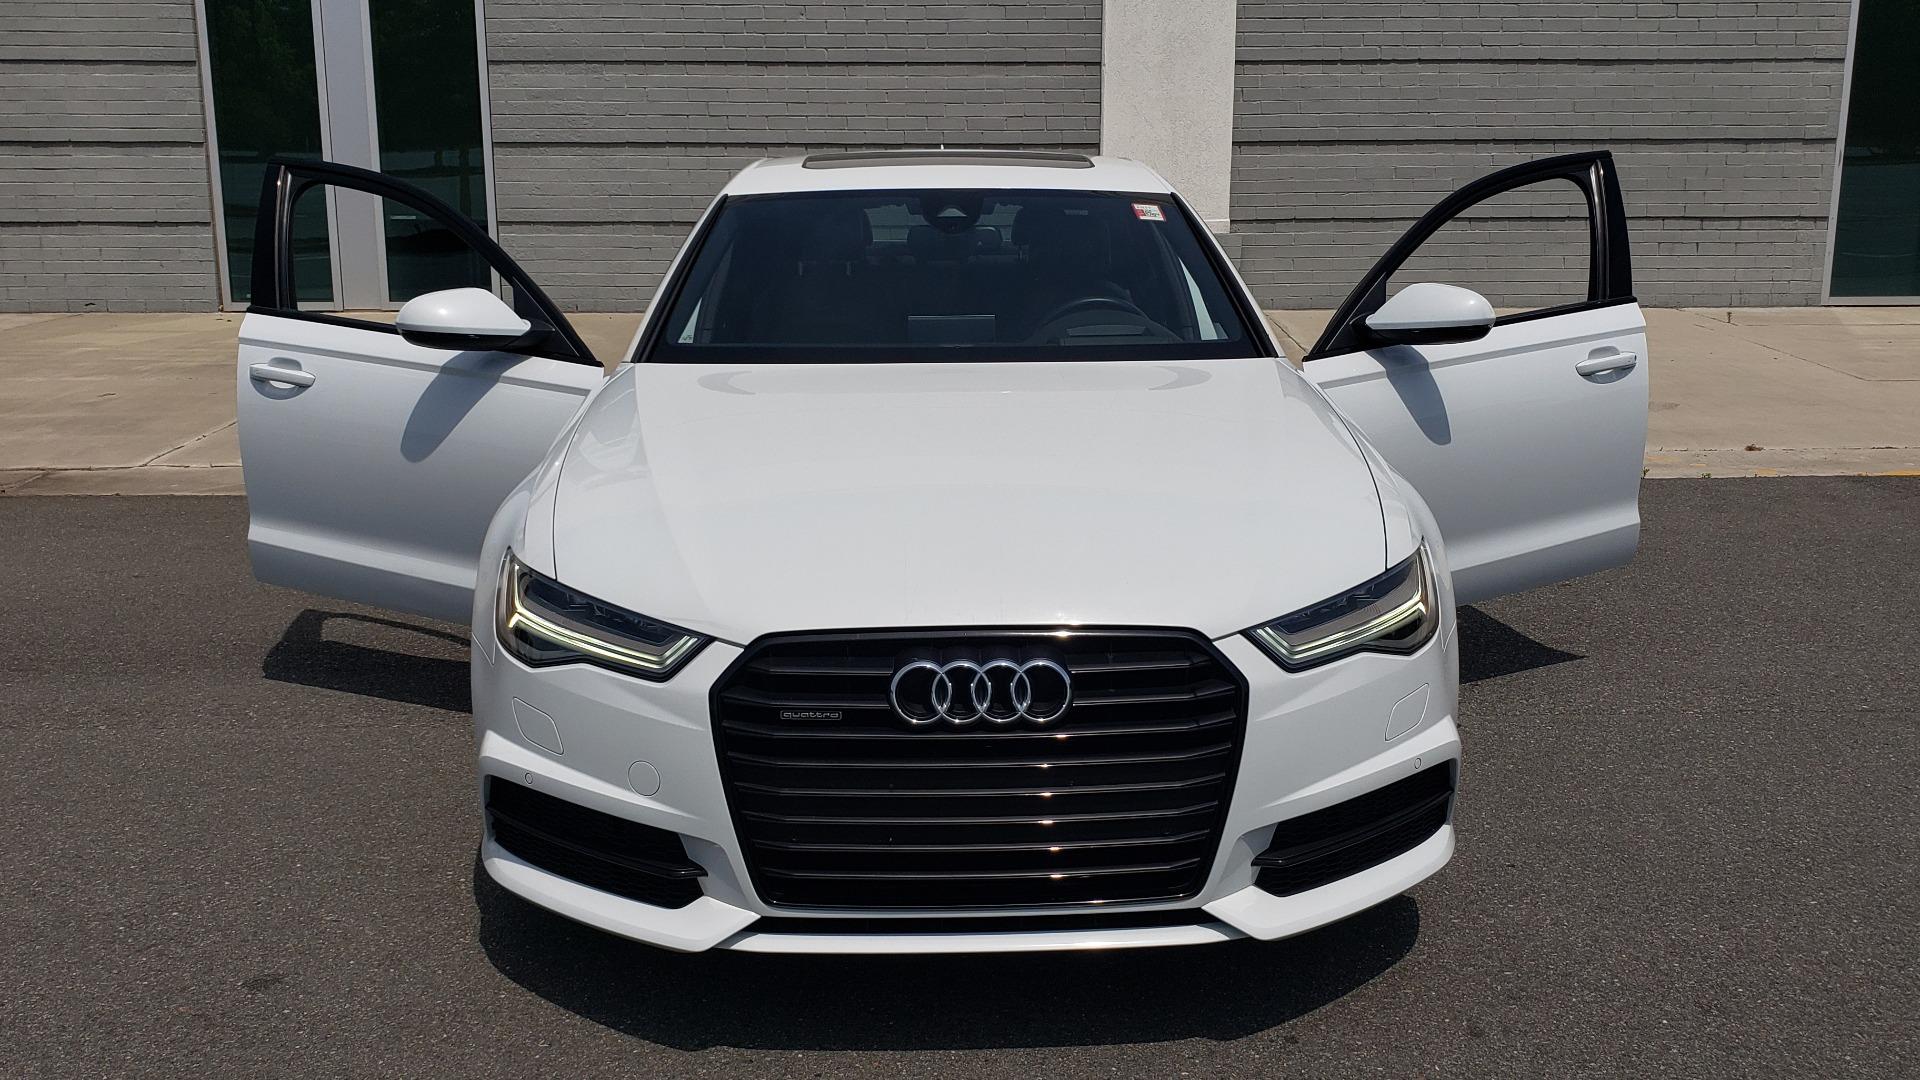 Used 2017 Audi A6 PRESTIGE SEDAN 3.0T / NAV / SUNROOF / BLACK OPTIC / CLD WTHR / REARVIEW for sale $30,797 at Formula Imports in Charlotte NC 28227 22